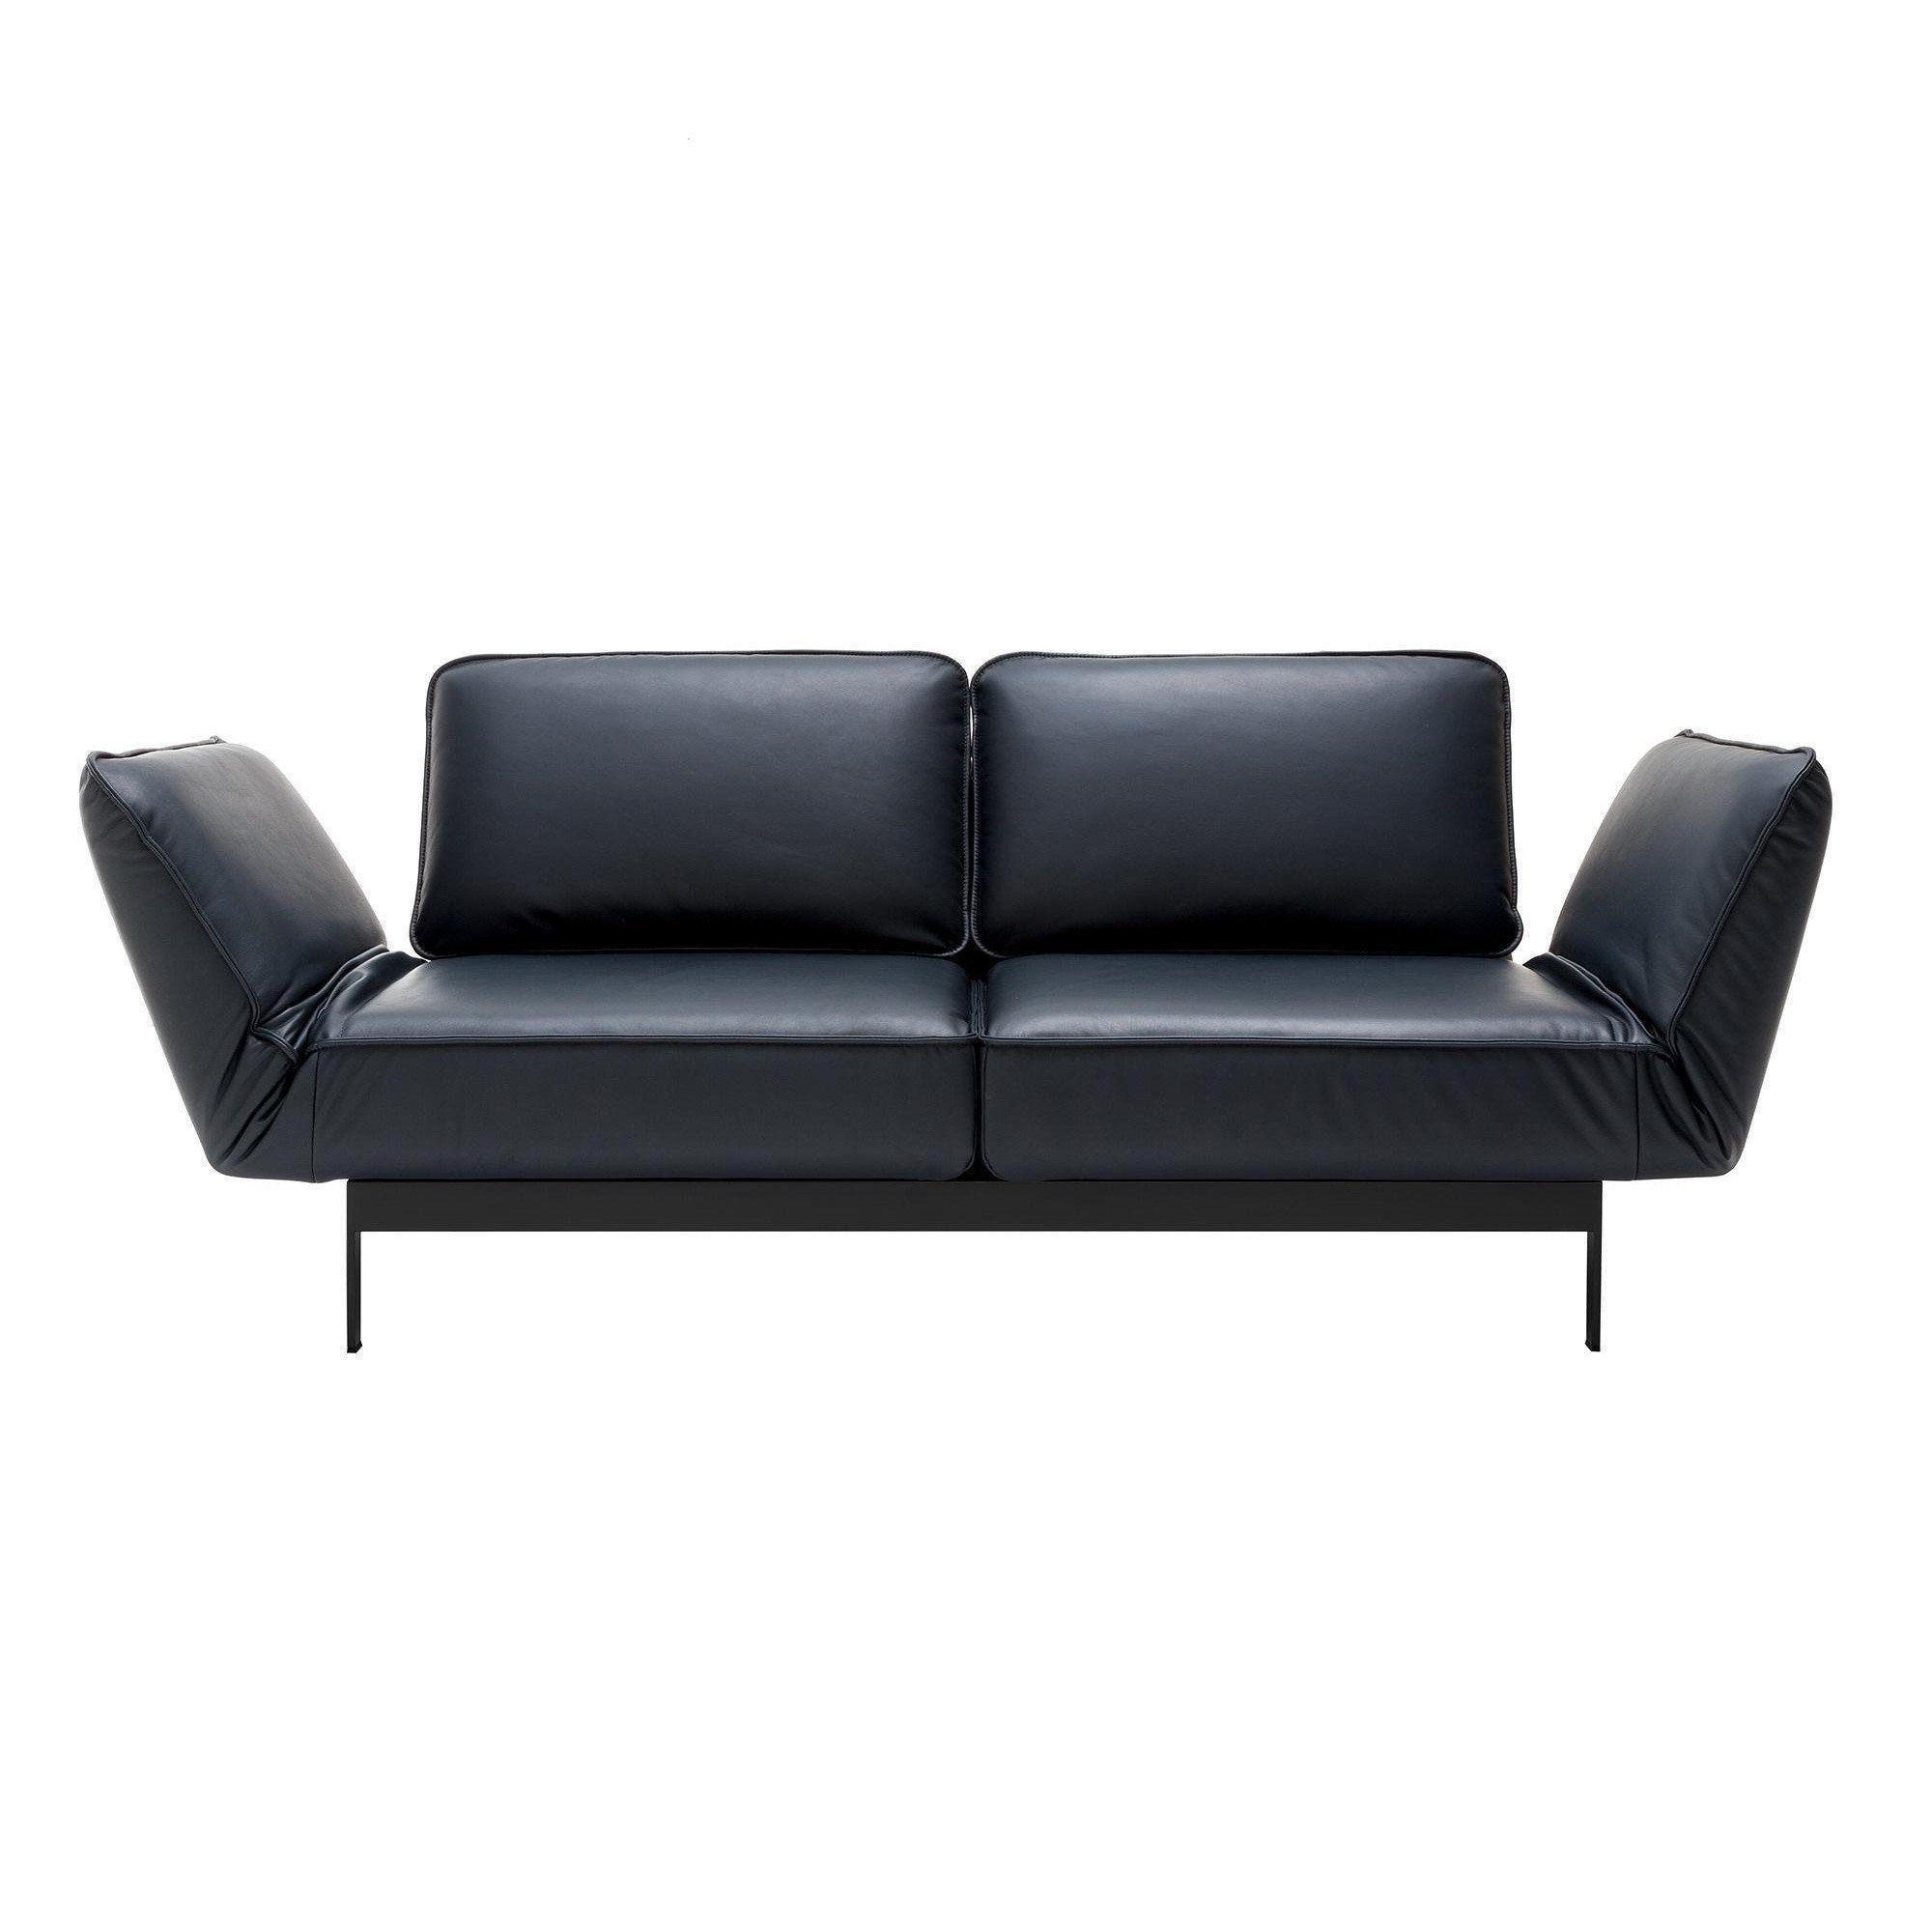 rolf benz 386 mera liegesofa rolf benz. Black Bedroom Furniture Sets. Home Design Ideas